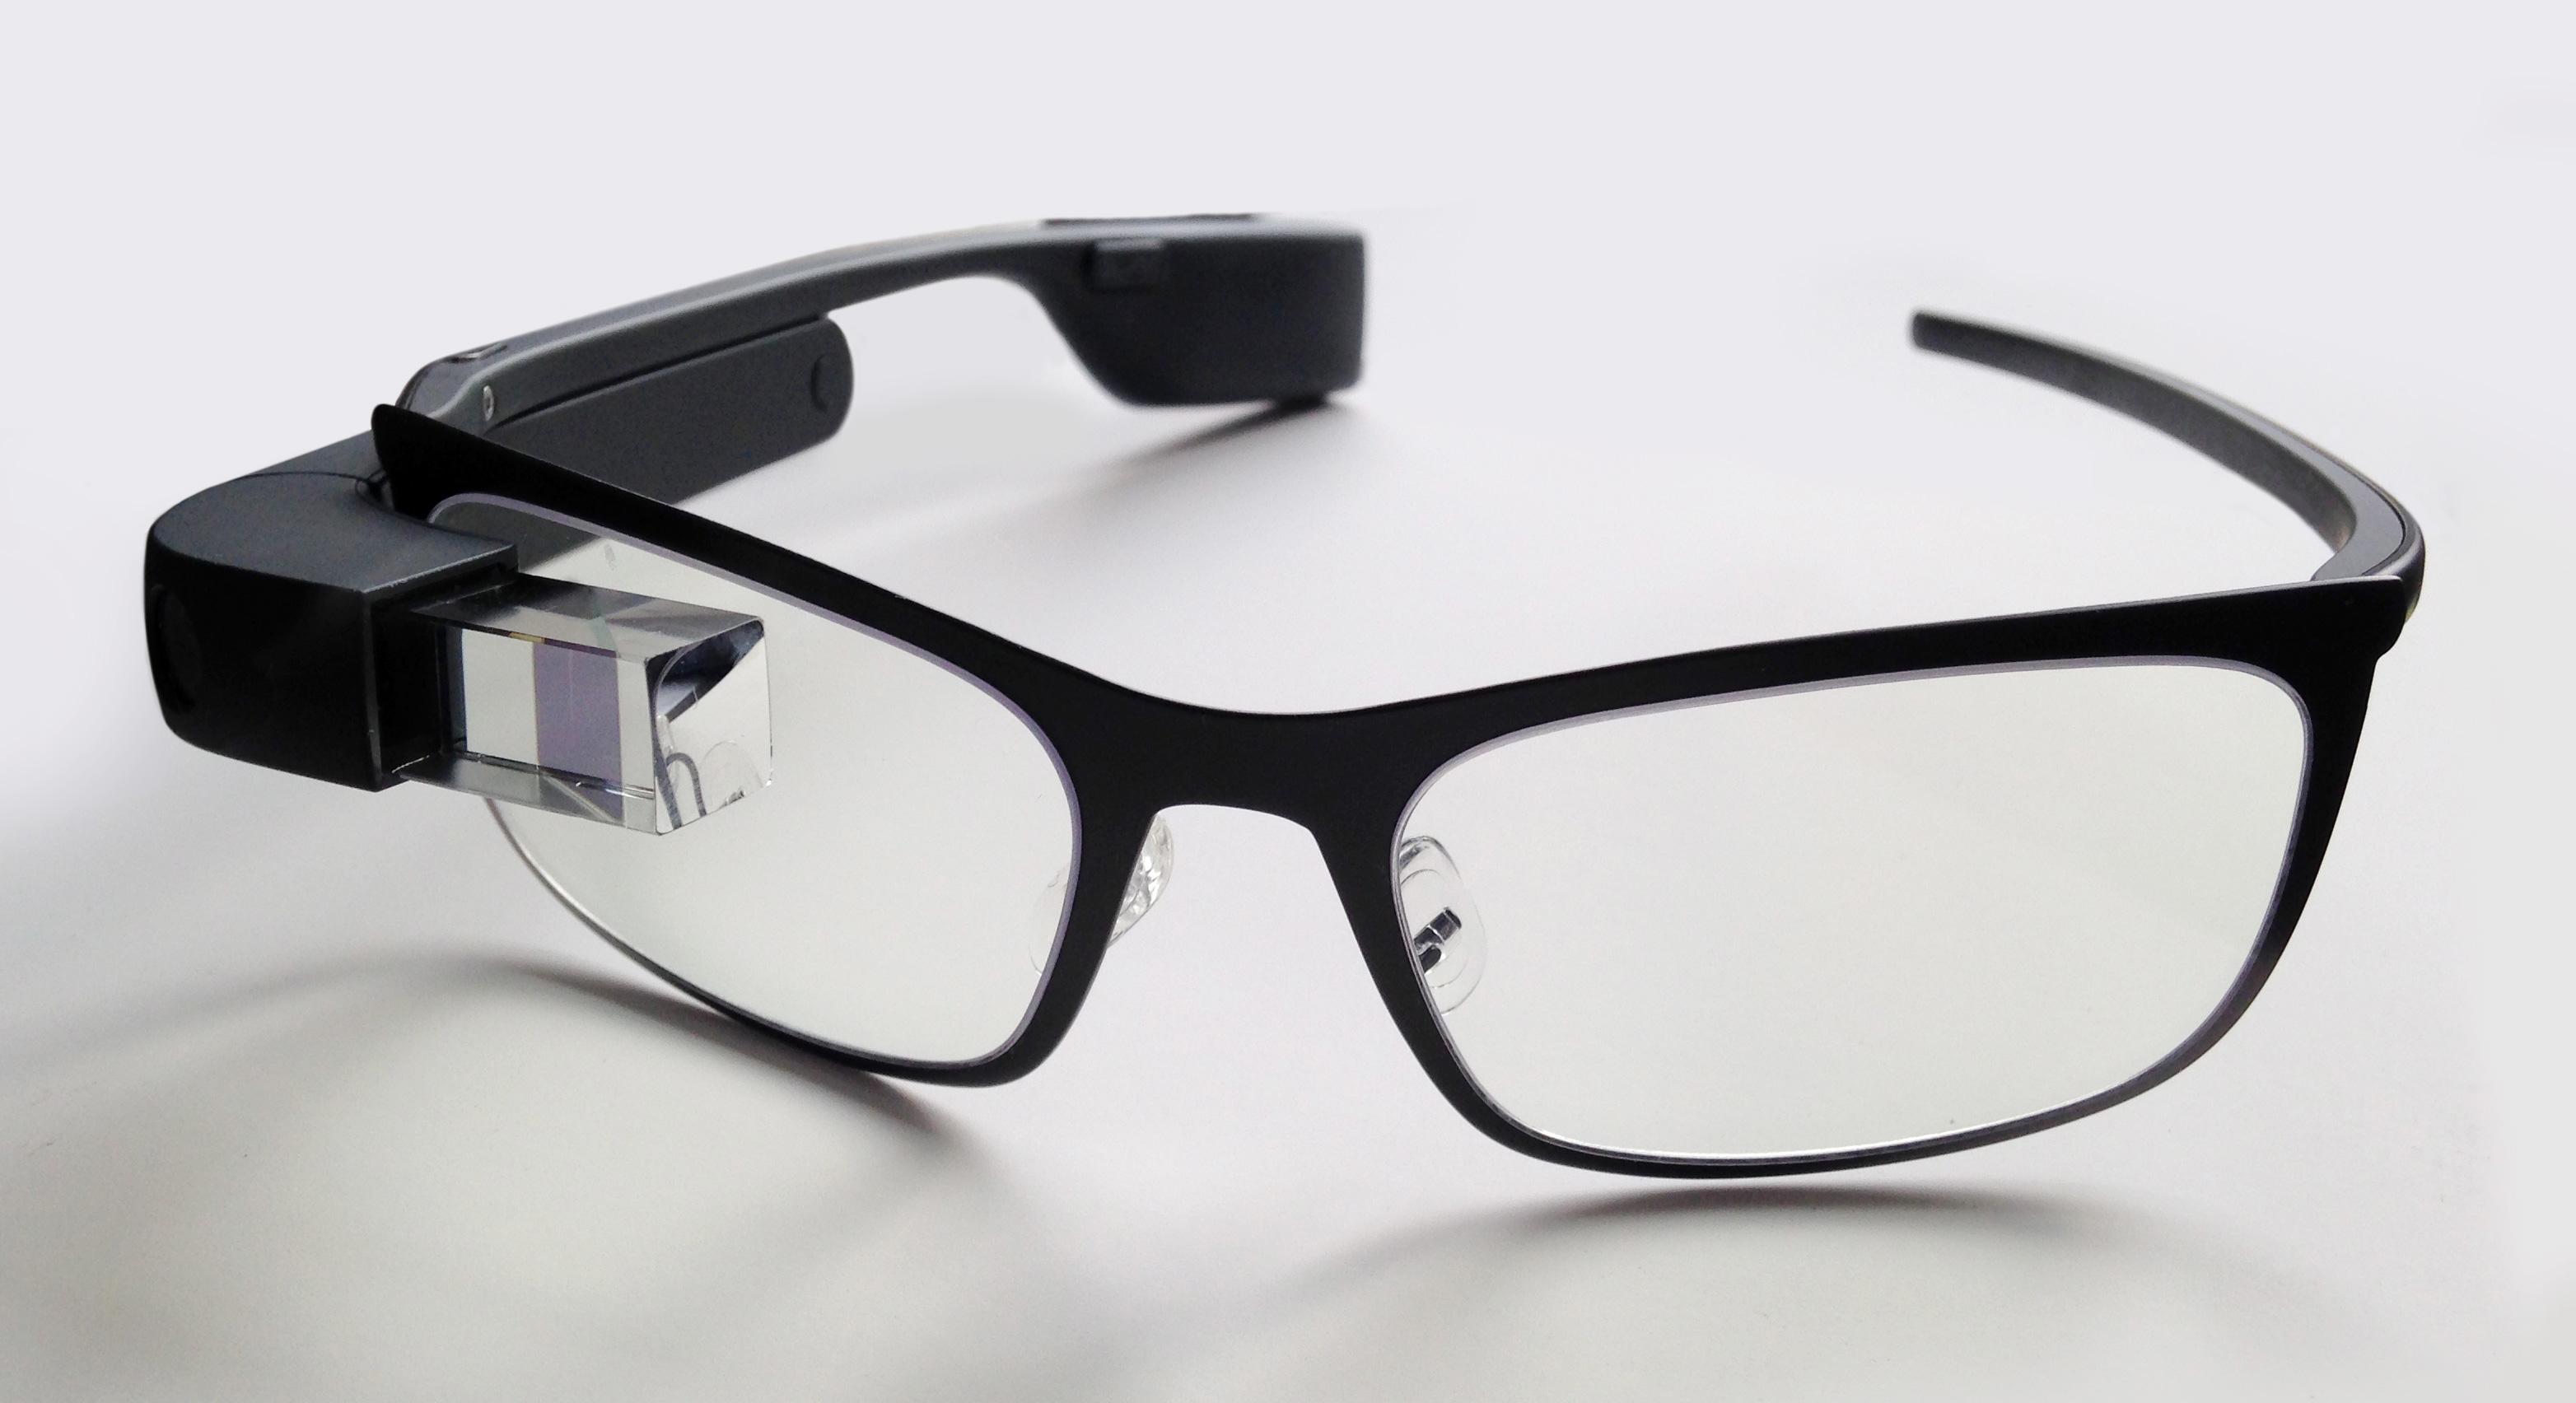 google_glass_with_frame.jpg